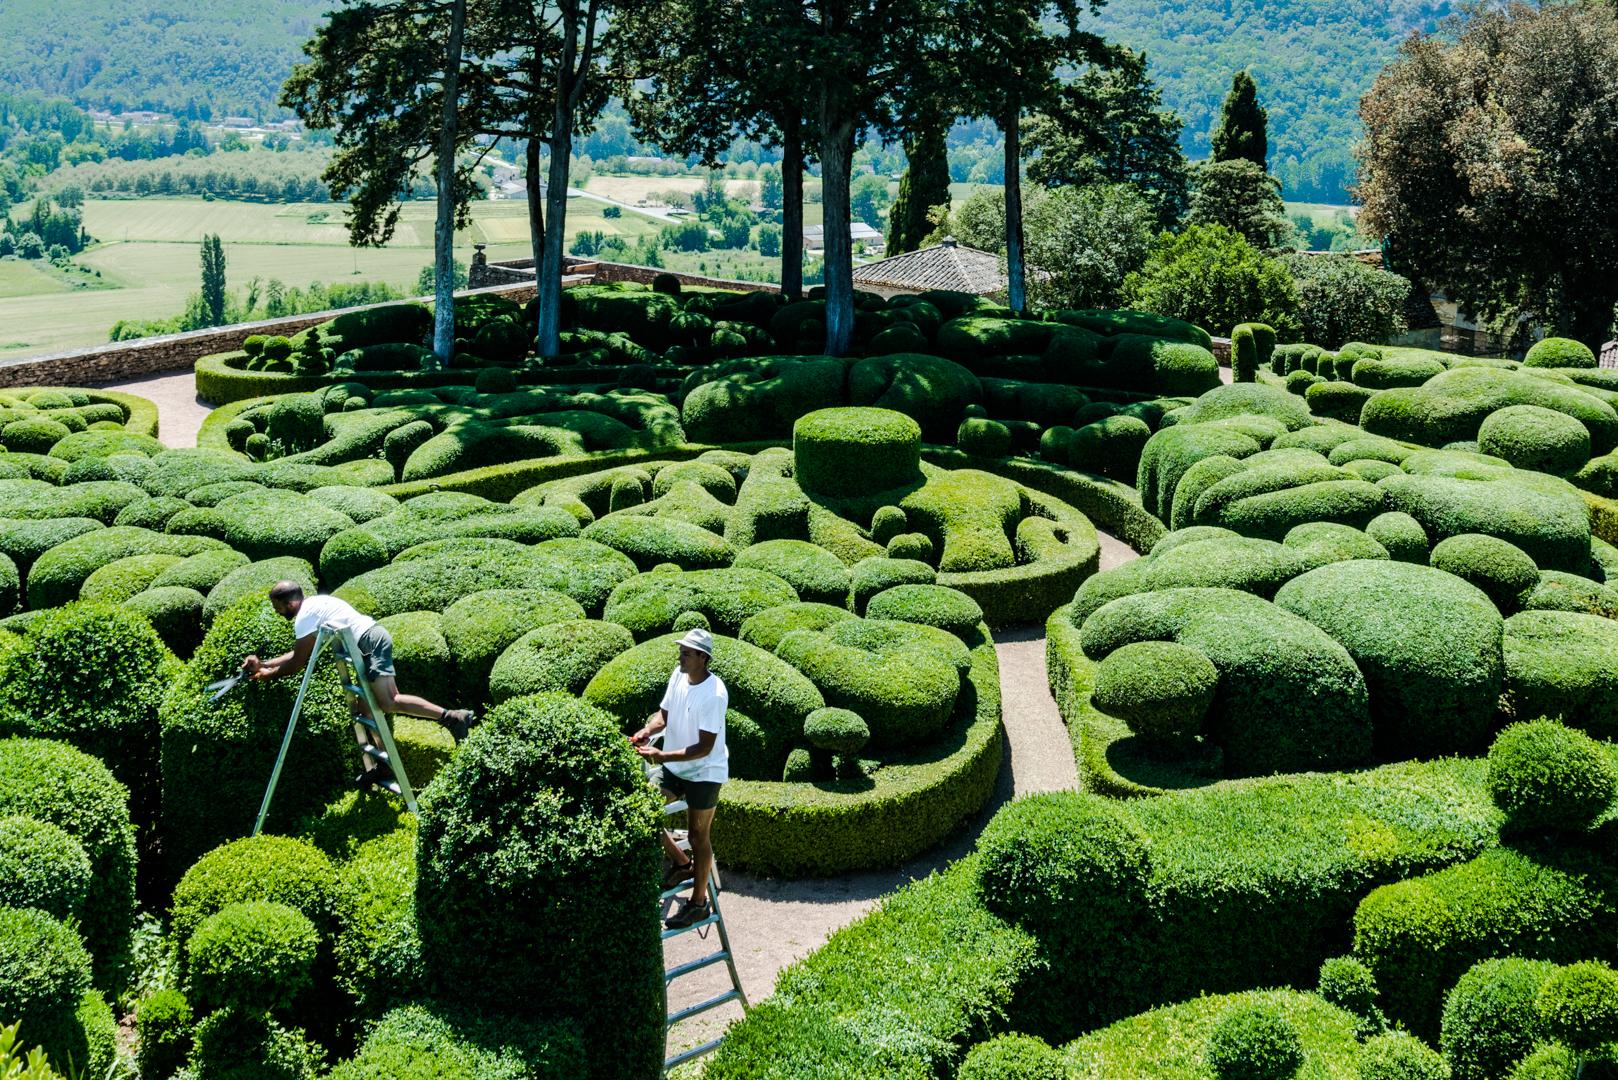 facing my fear of heights at Chateau de Marqueyssac Les Jardins de Marqueyssac aka the belvedere of the dordogne